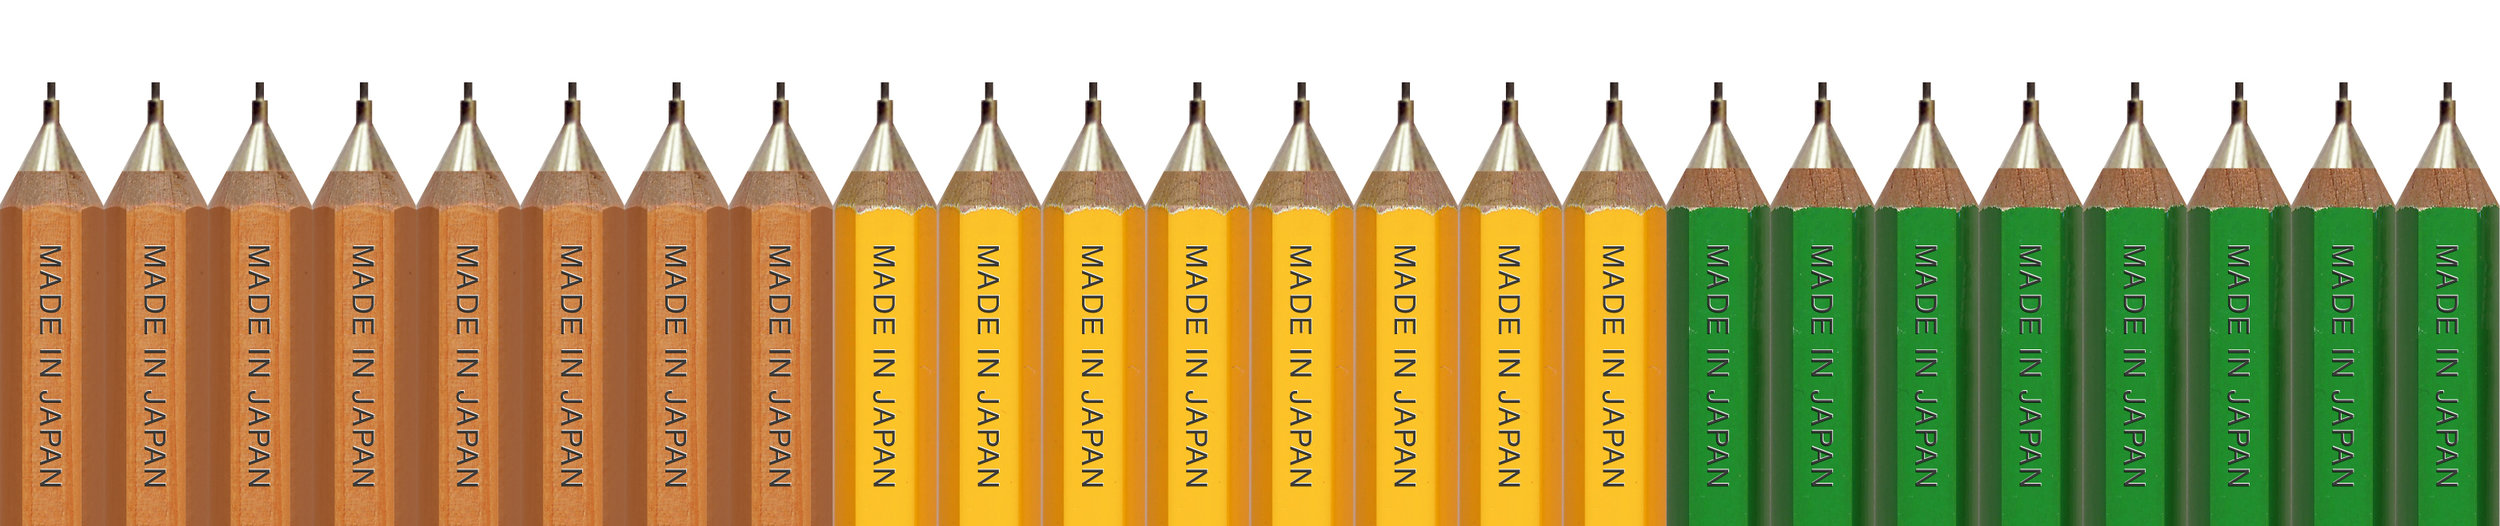 Camel Half Size Mechanical Pencils (Natural Color, Yellow, Green)